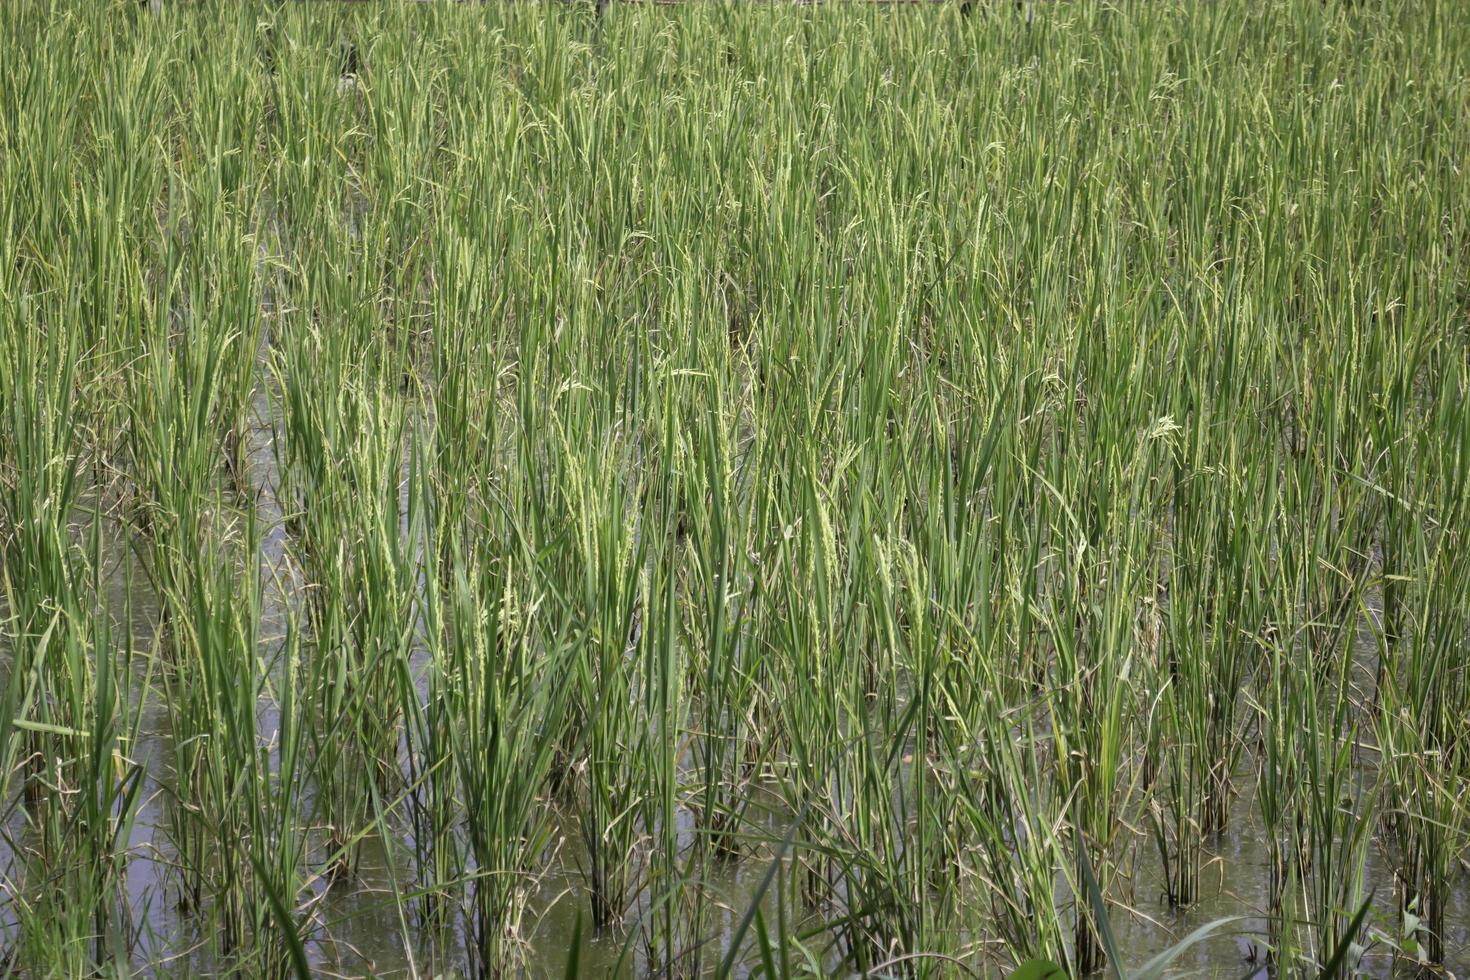 champ de riz vert photo